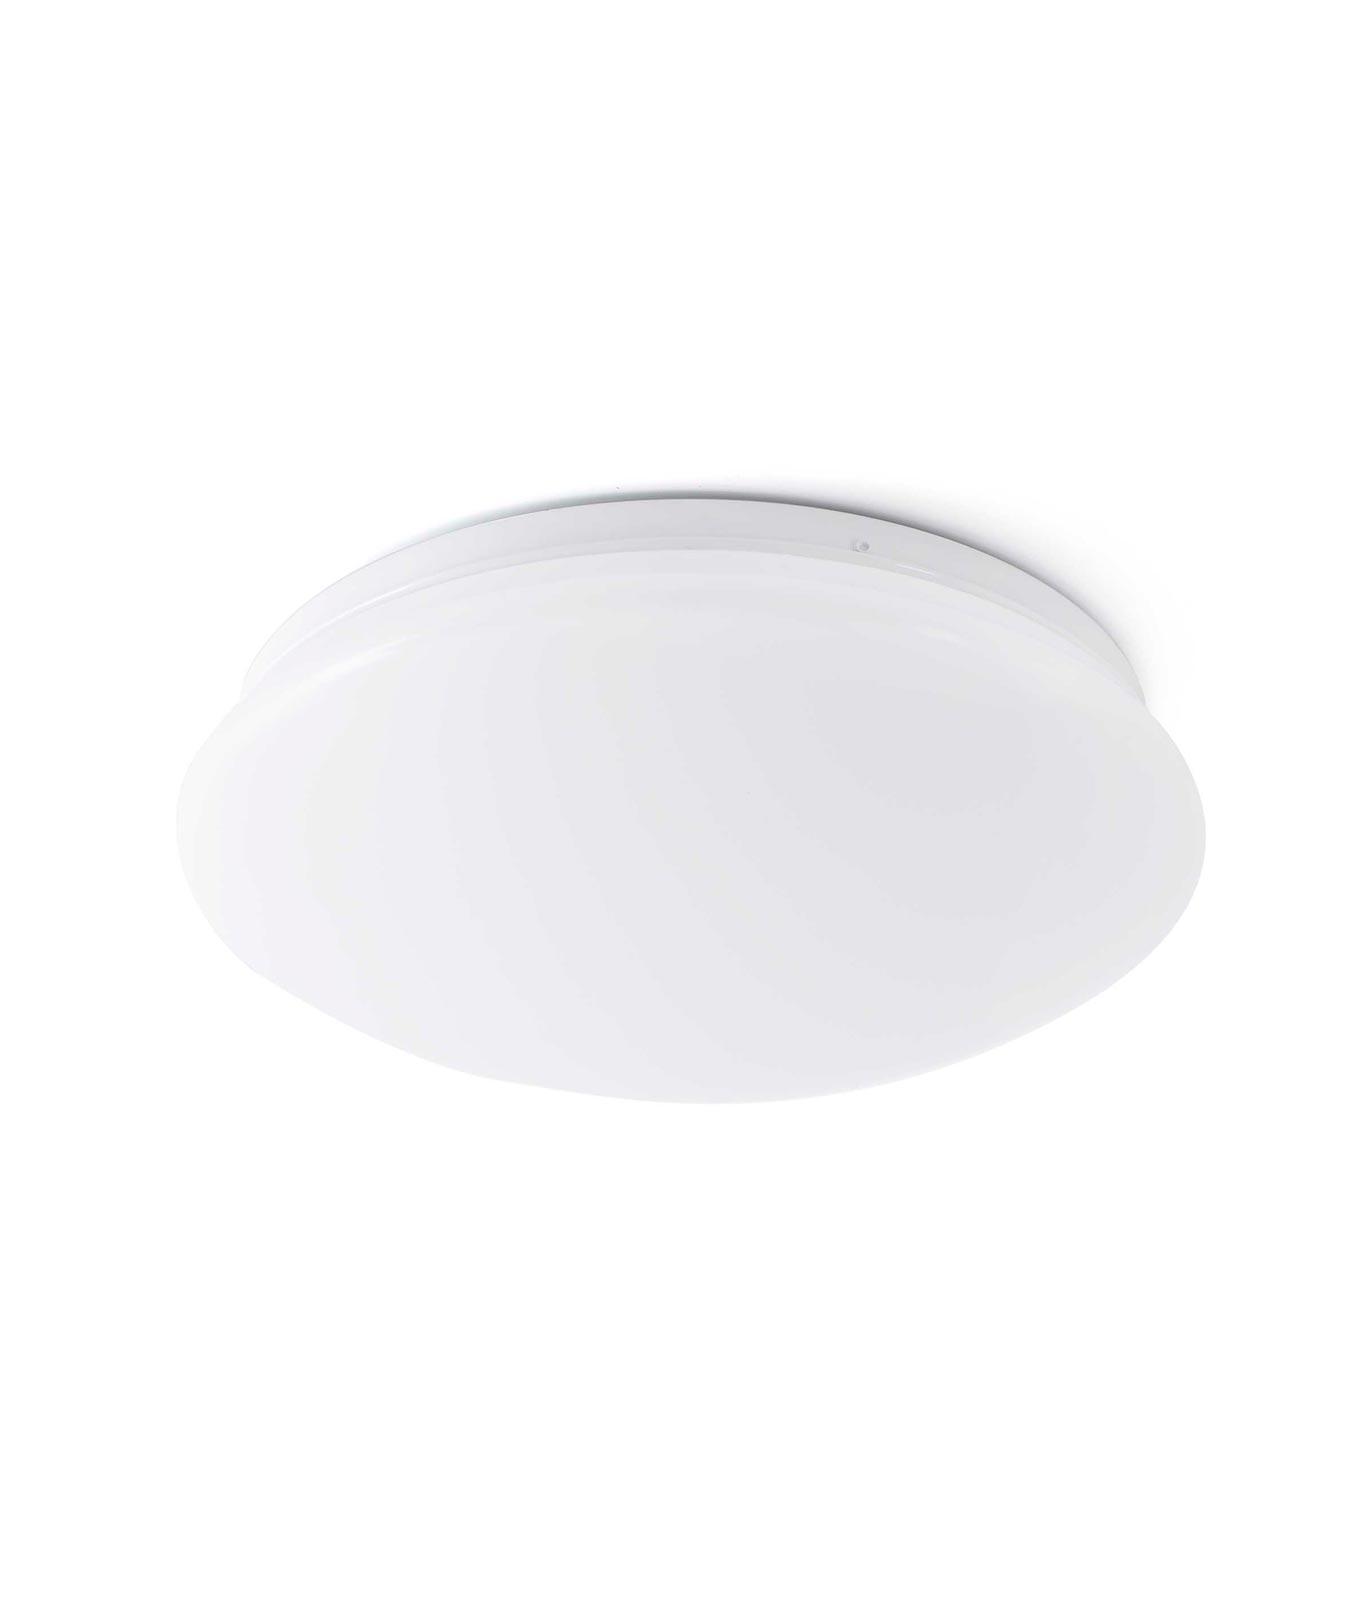 Plafón LED grande RONDA blanco